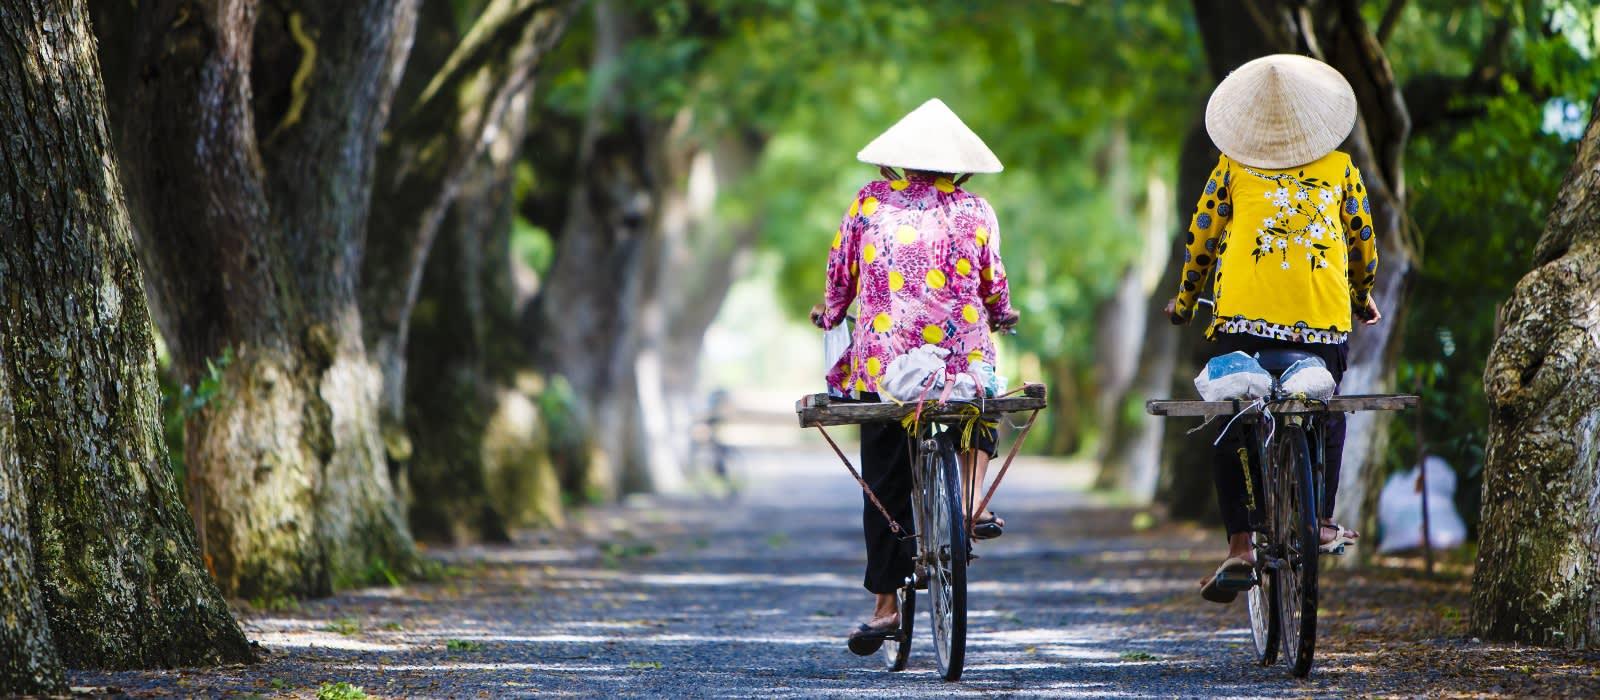 Is Vietnam safe